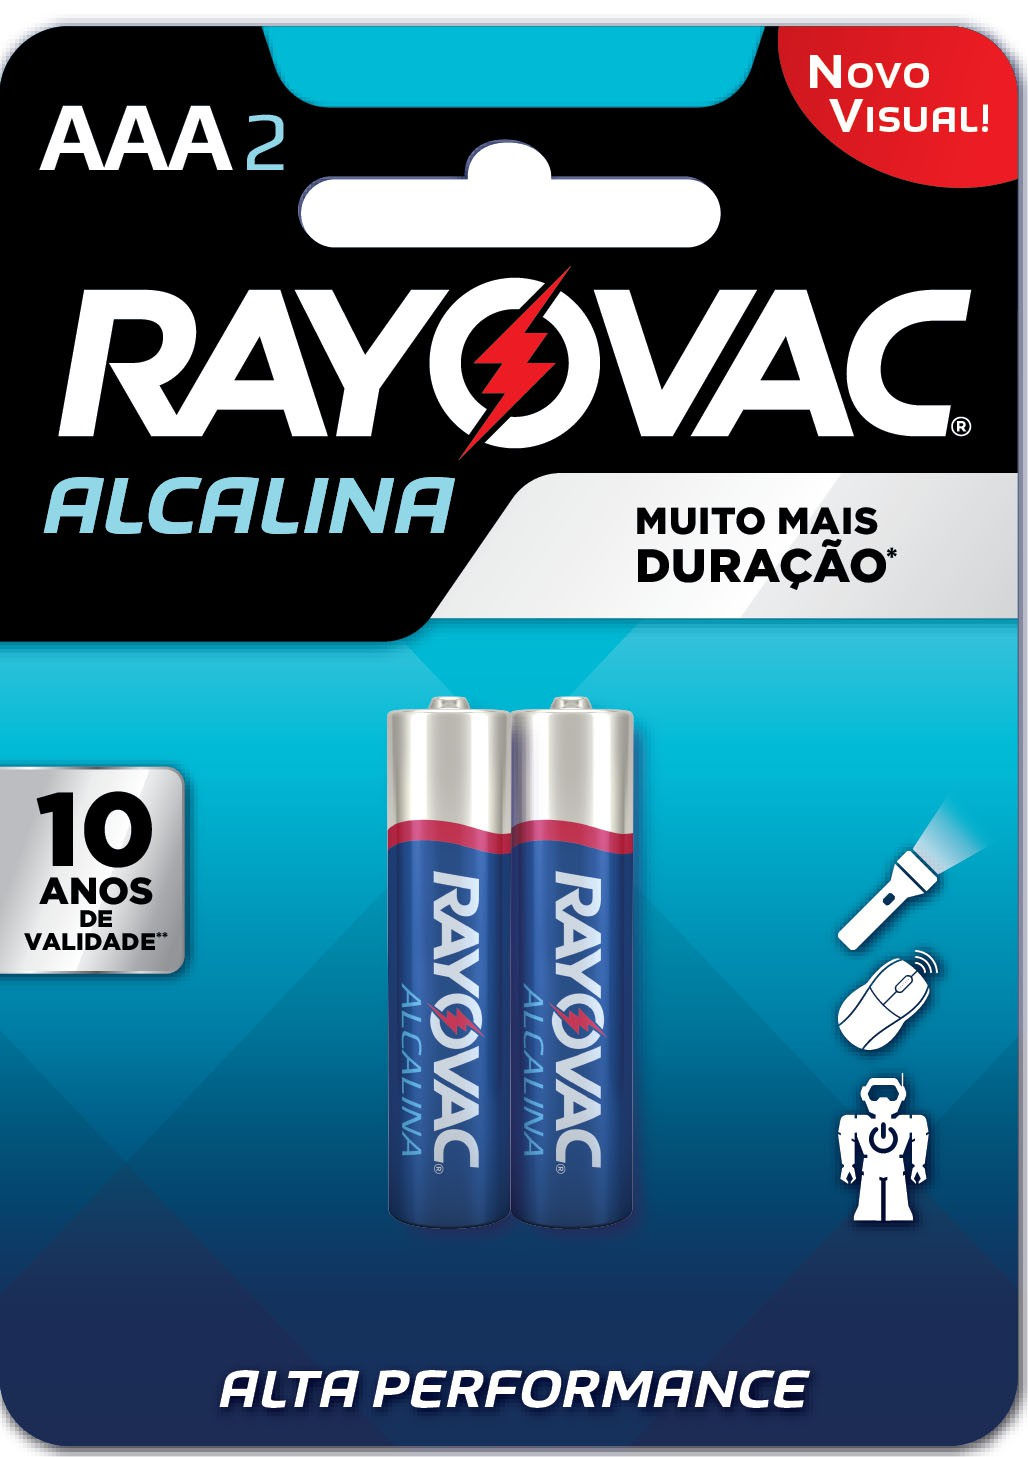 04 Pilhas AAA Alcalina RAYOVAC 2 cart c/ 2 unid